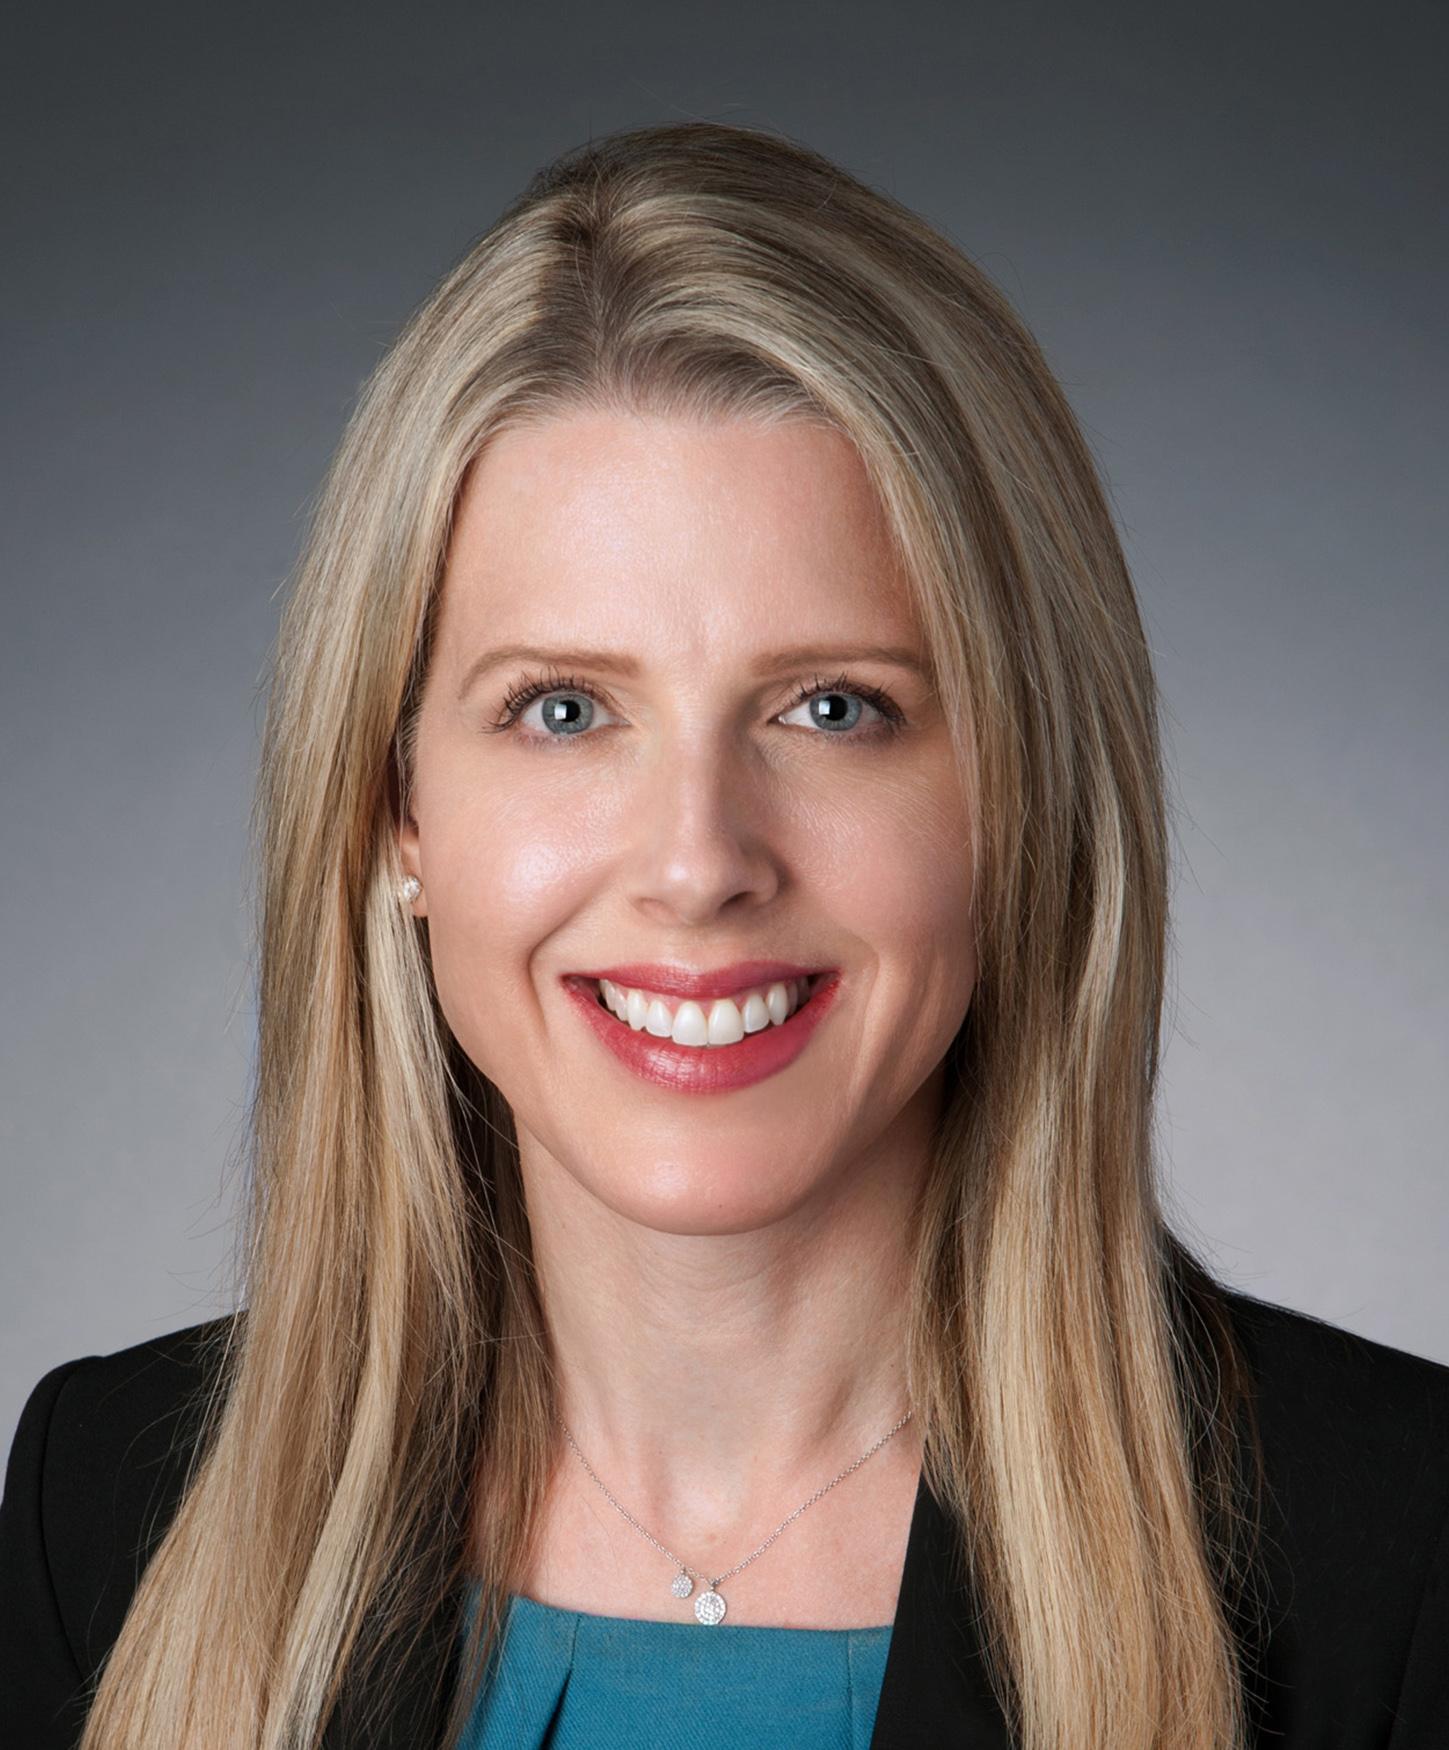 Image of Jessica L. Everett-Garcia